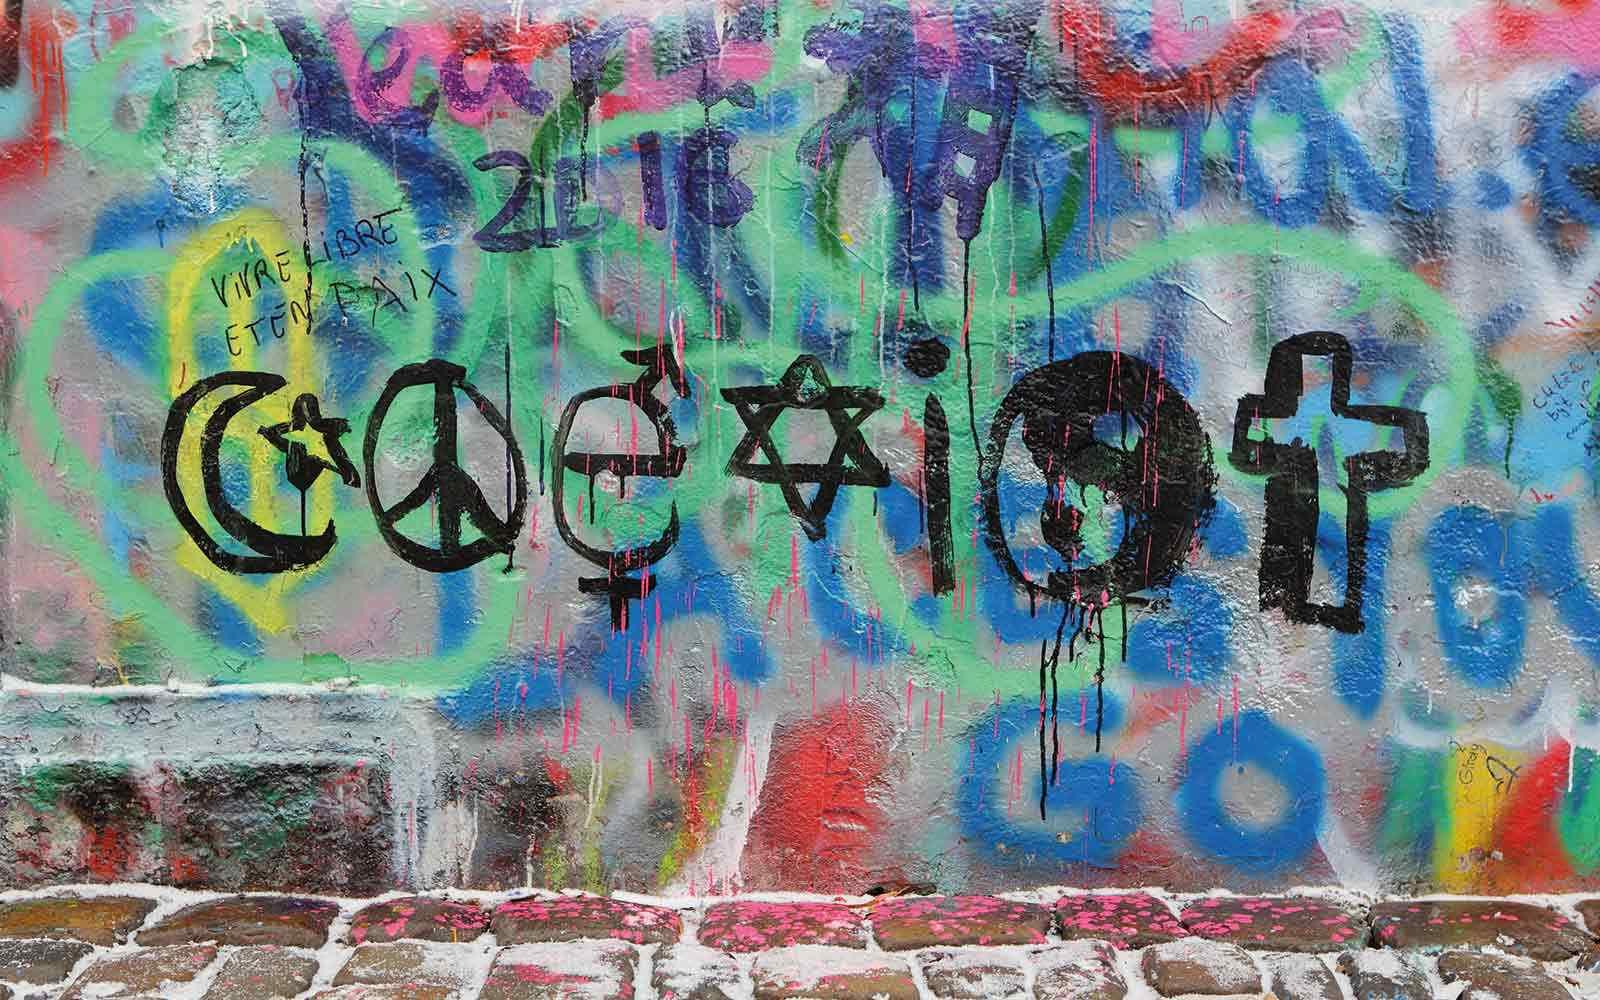 Religious symbols on a graffiti background